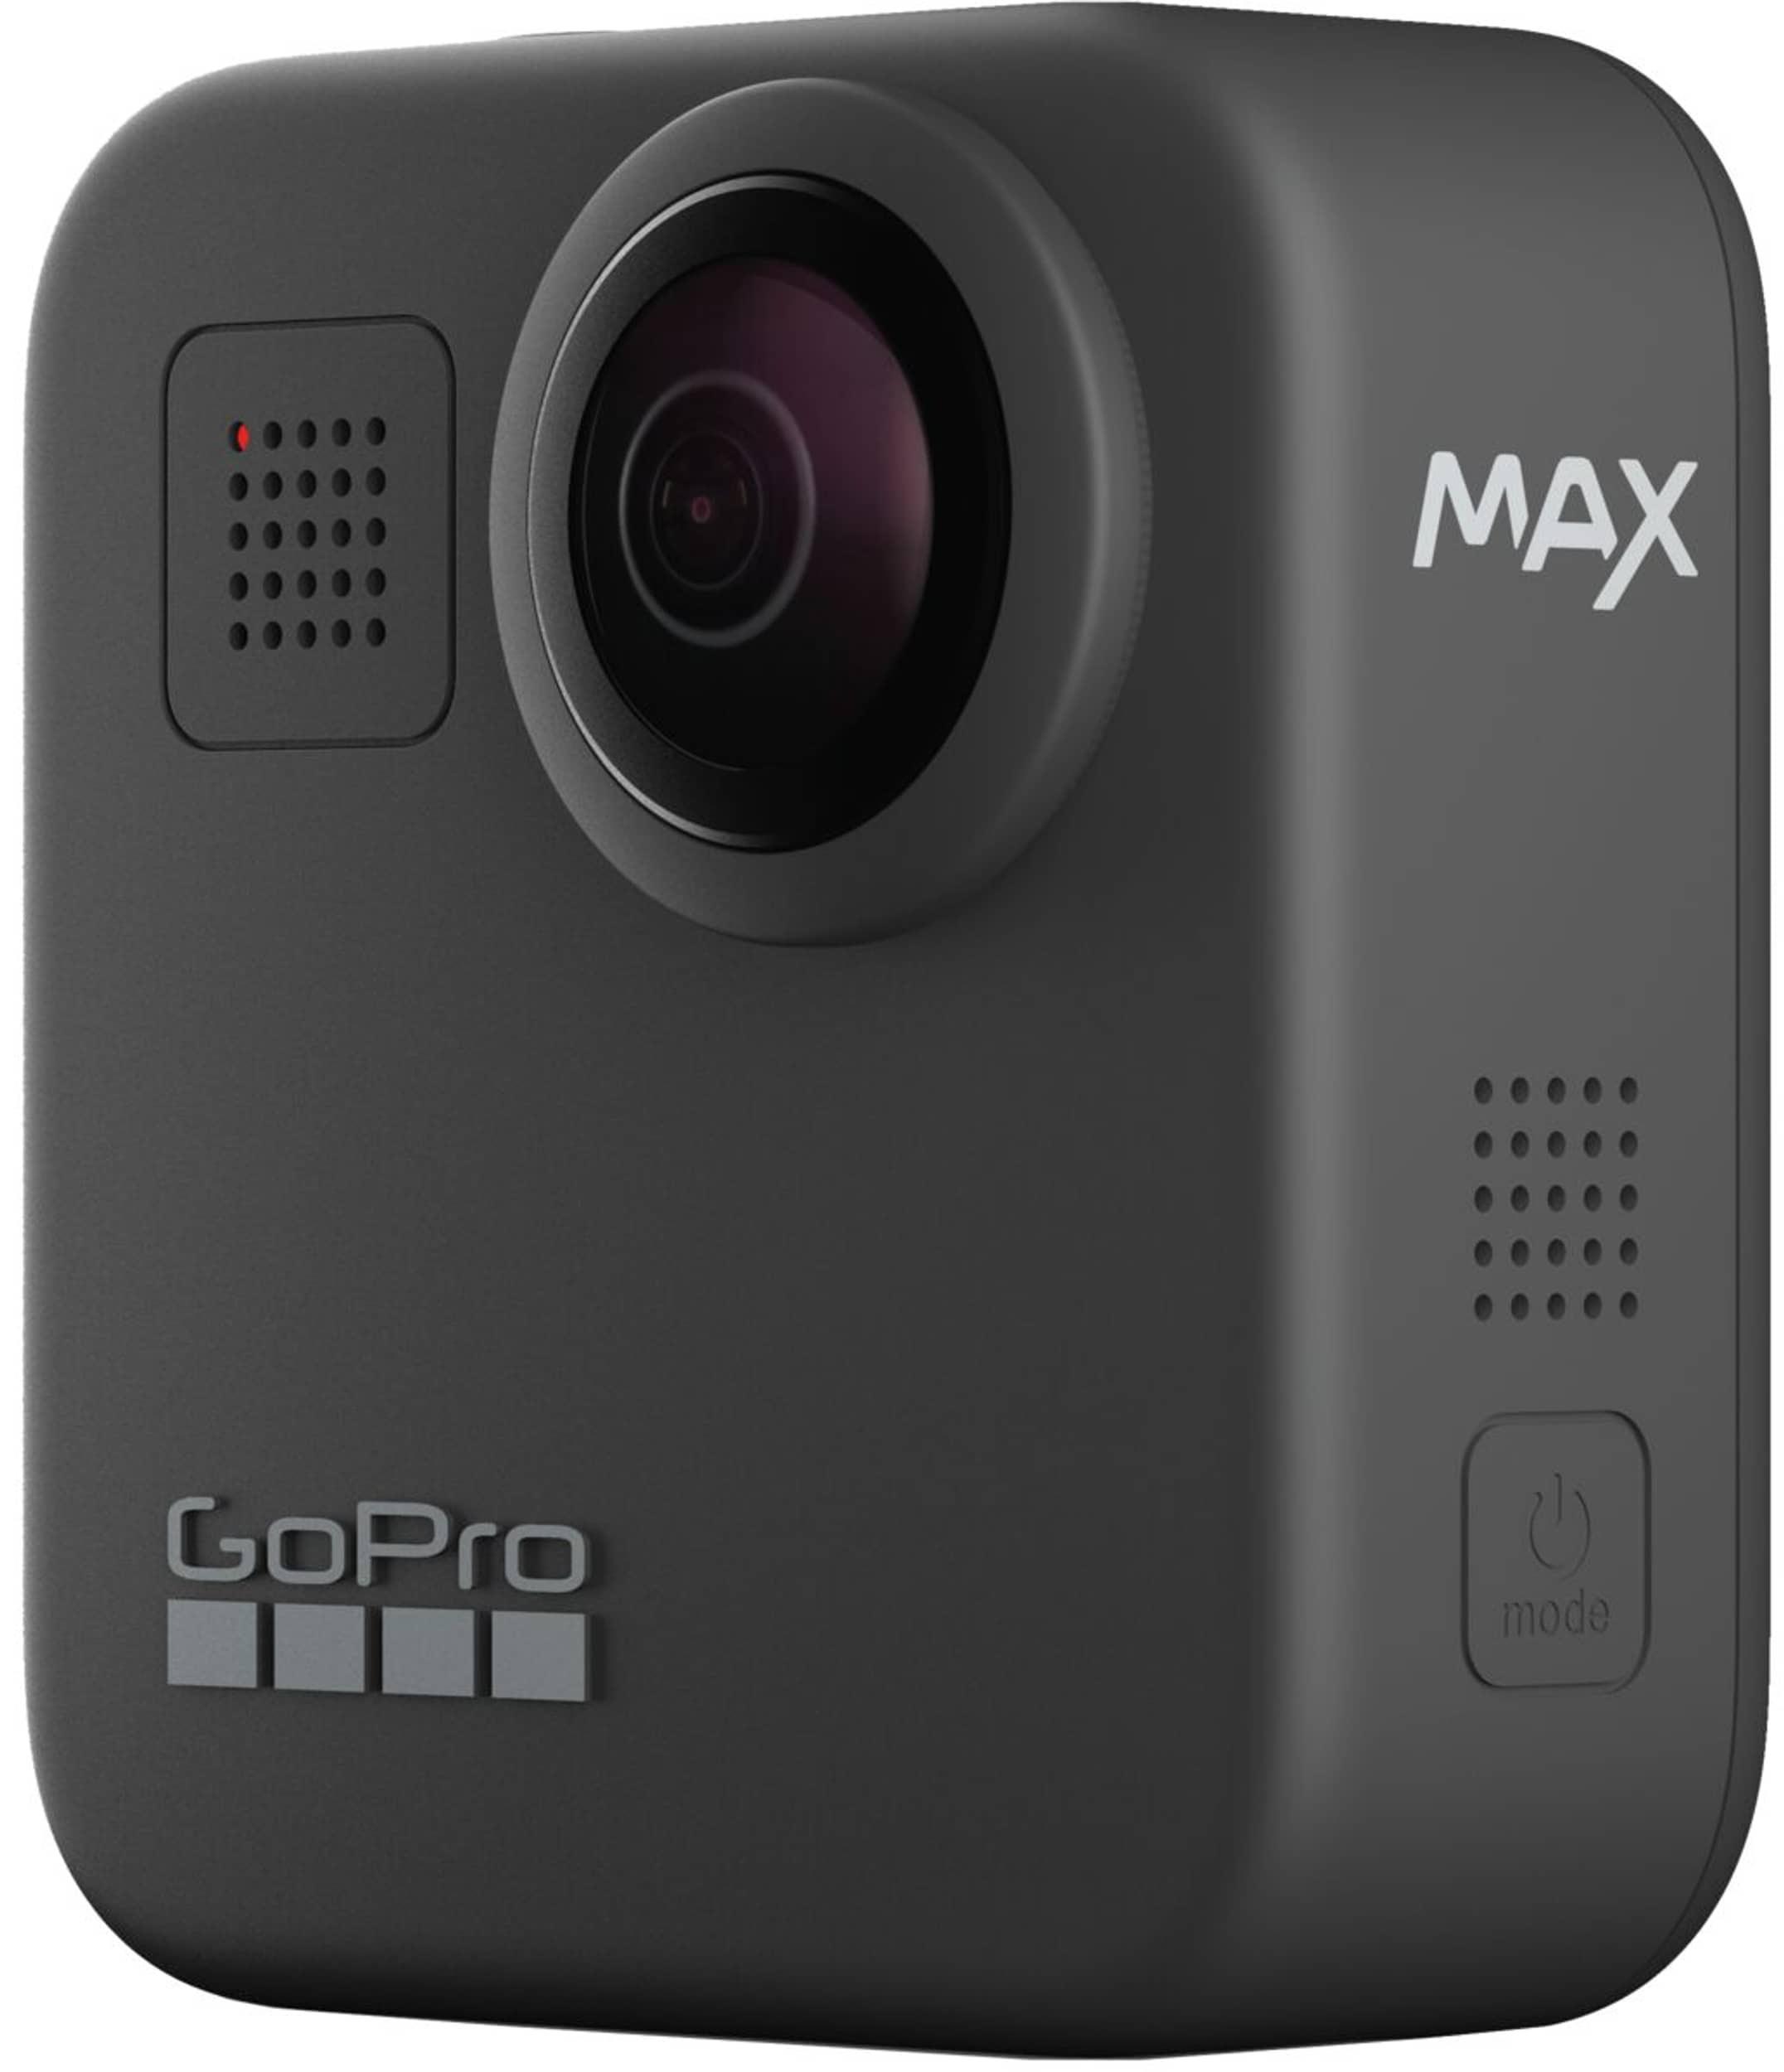 Caméra embarquée GoPro Max (Frontaliers Suisses)